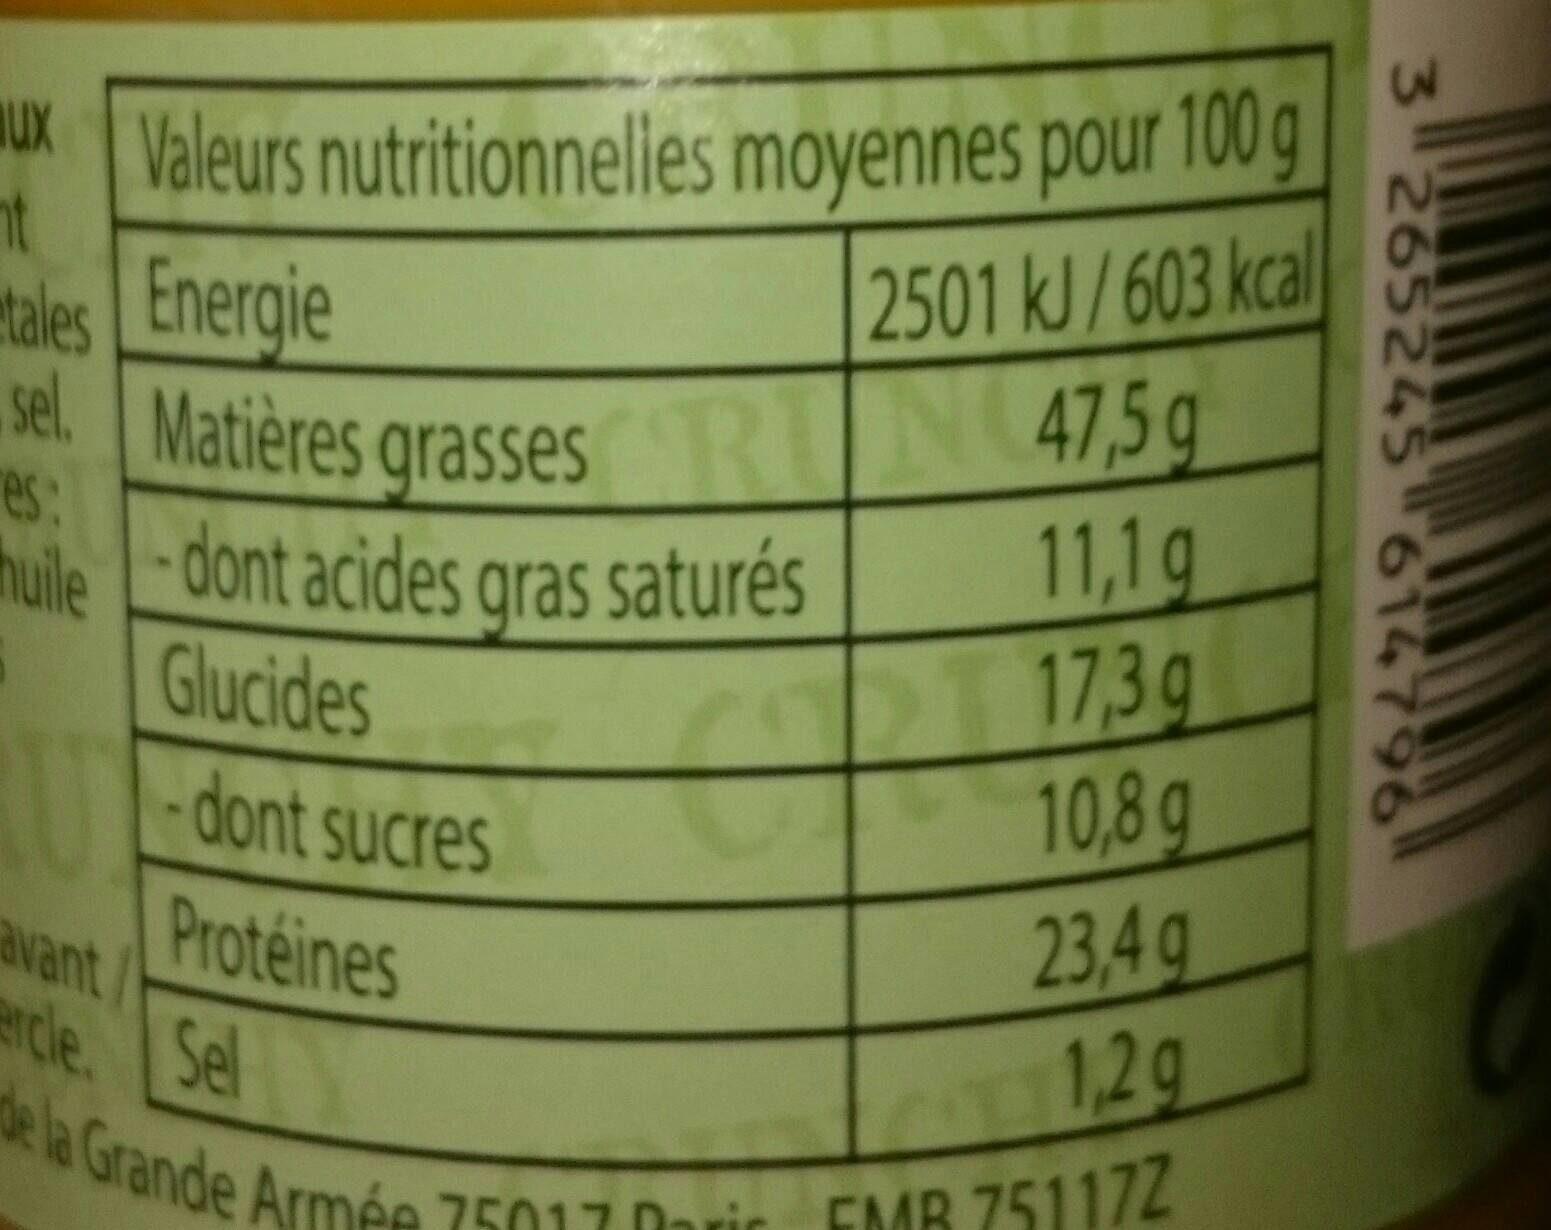 Peanut Butter Crunchy - Informations nutritionnelles - fr